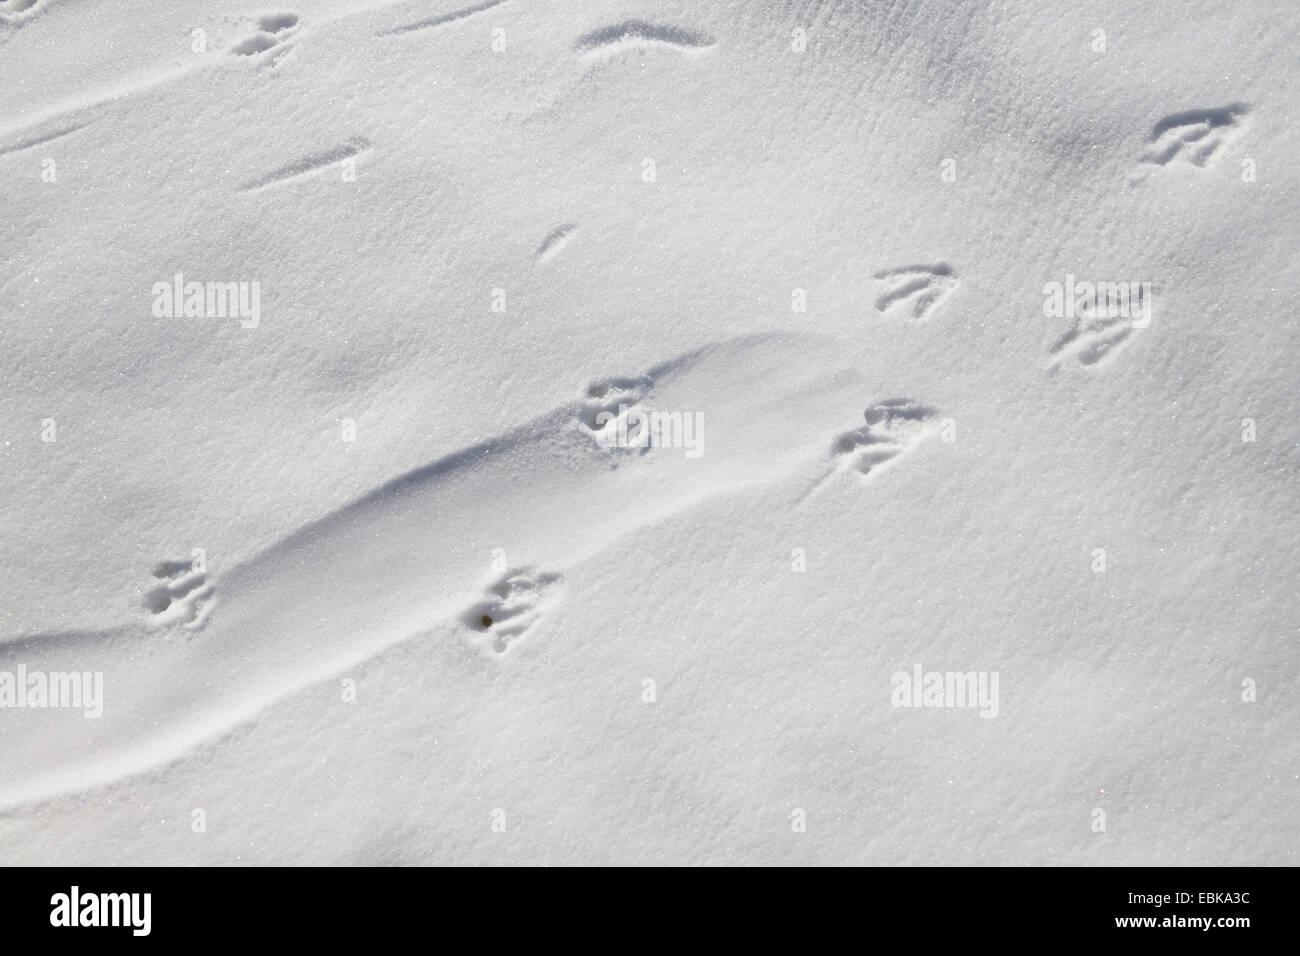 adelie penguin (Pygoscelis adeliae), tracks of a penguin gliding on the belly , Antarctica - Stock Image